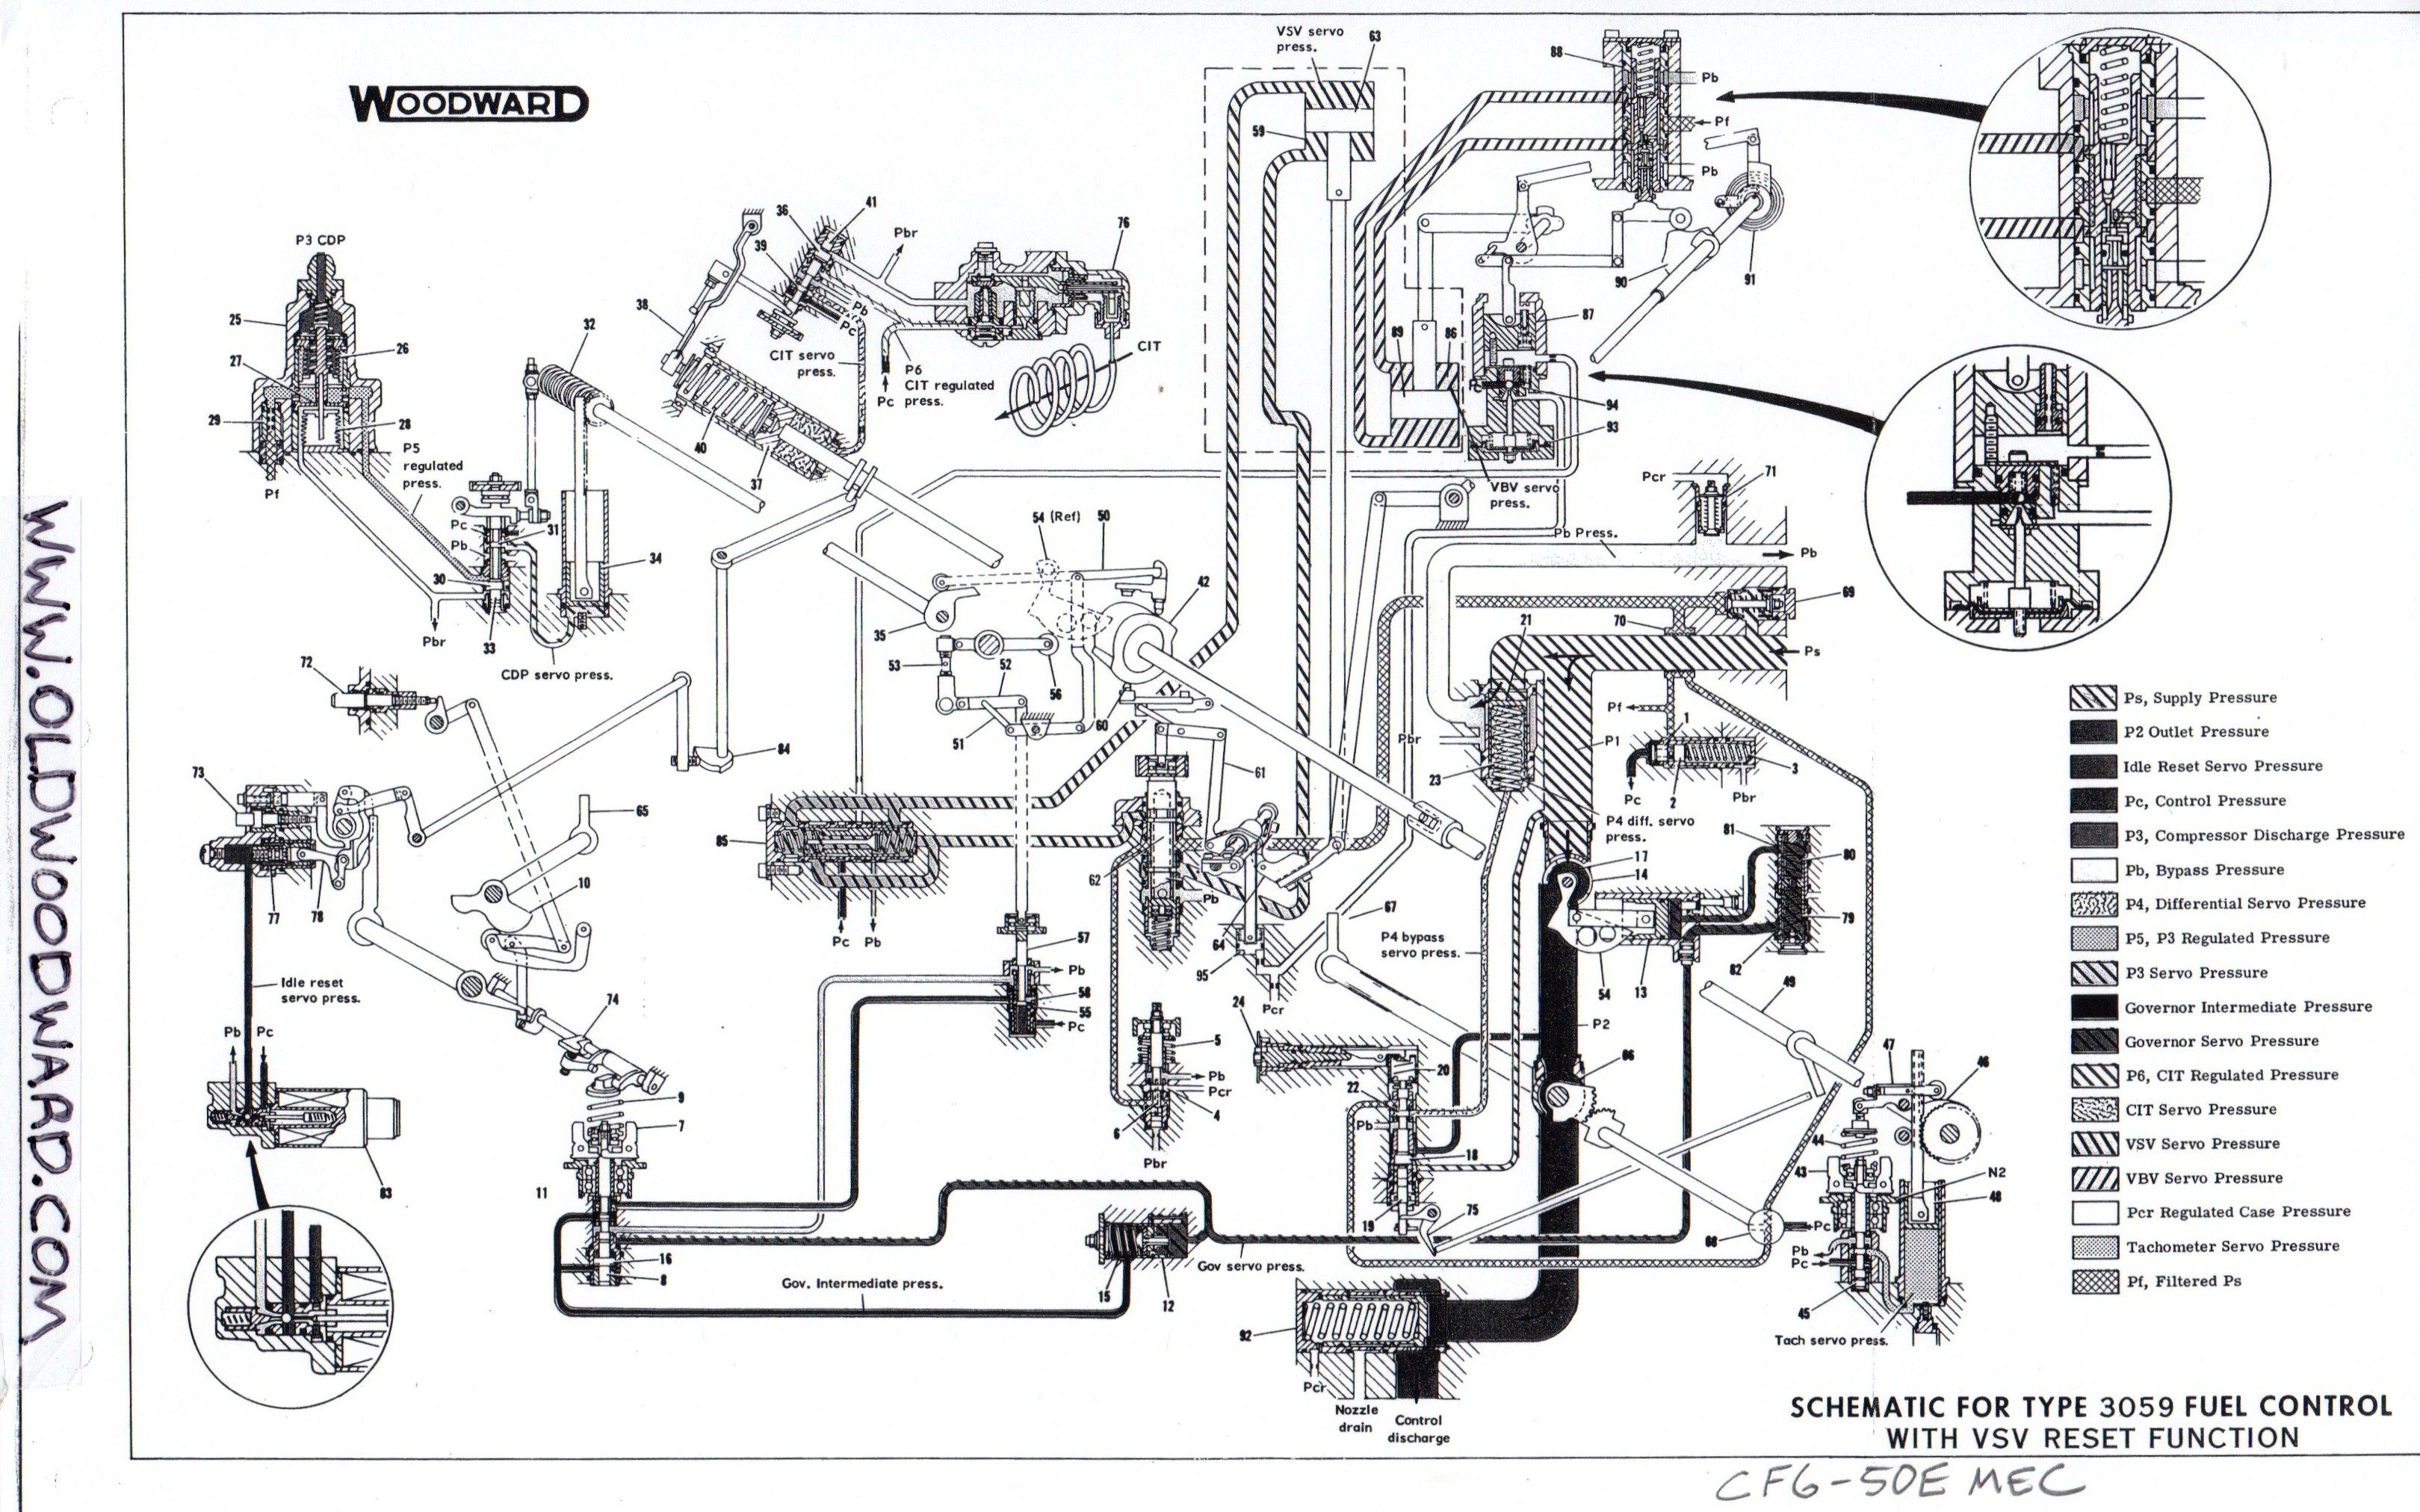 cf6 50 engine manual